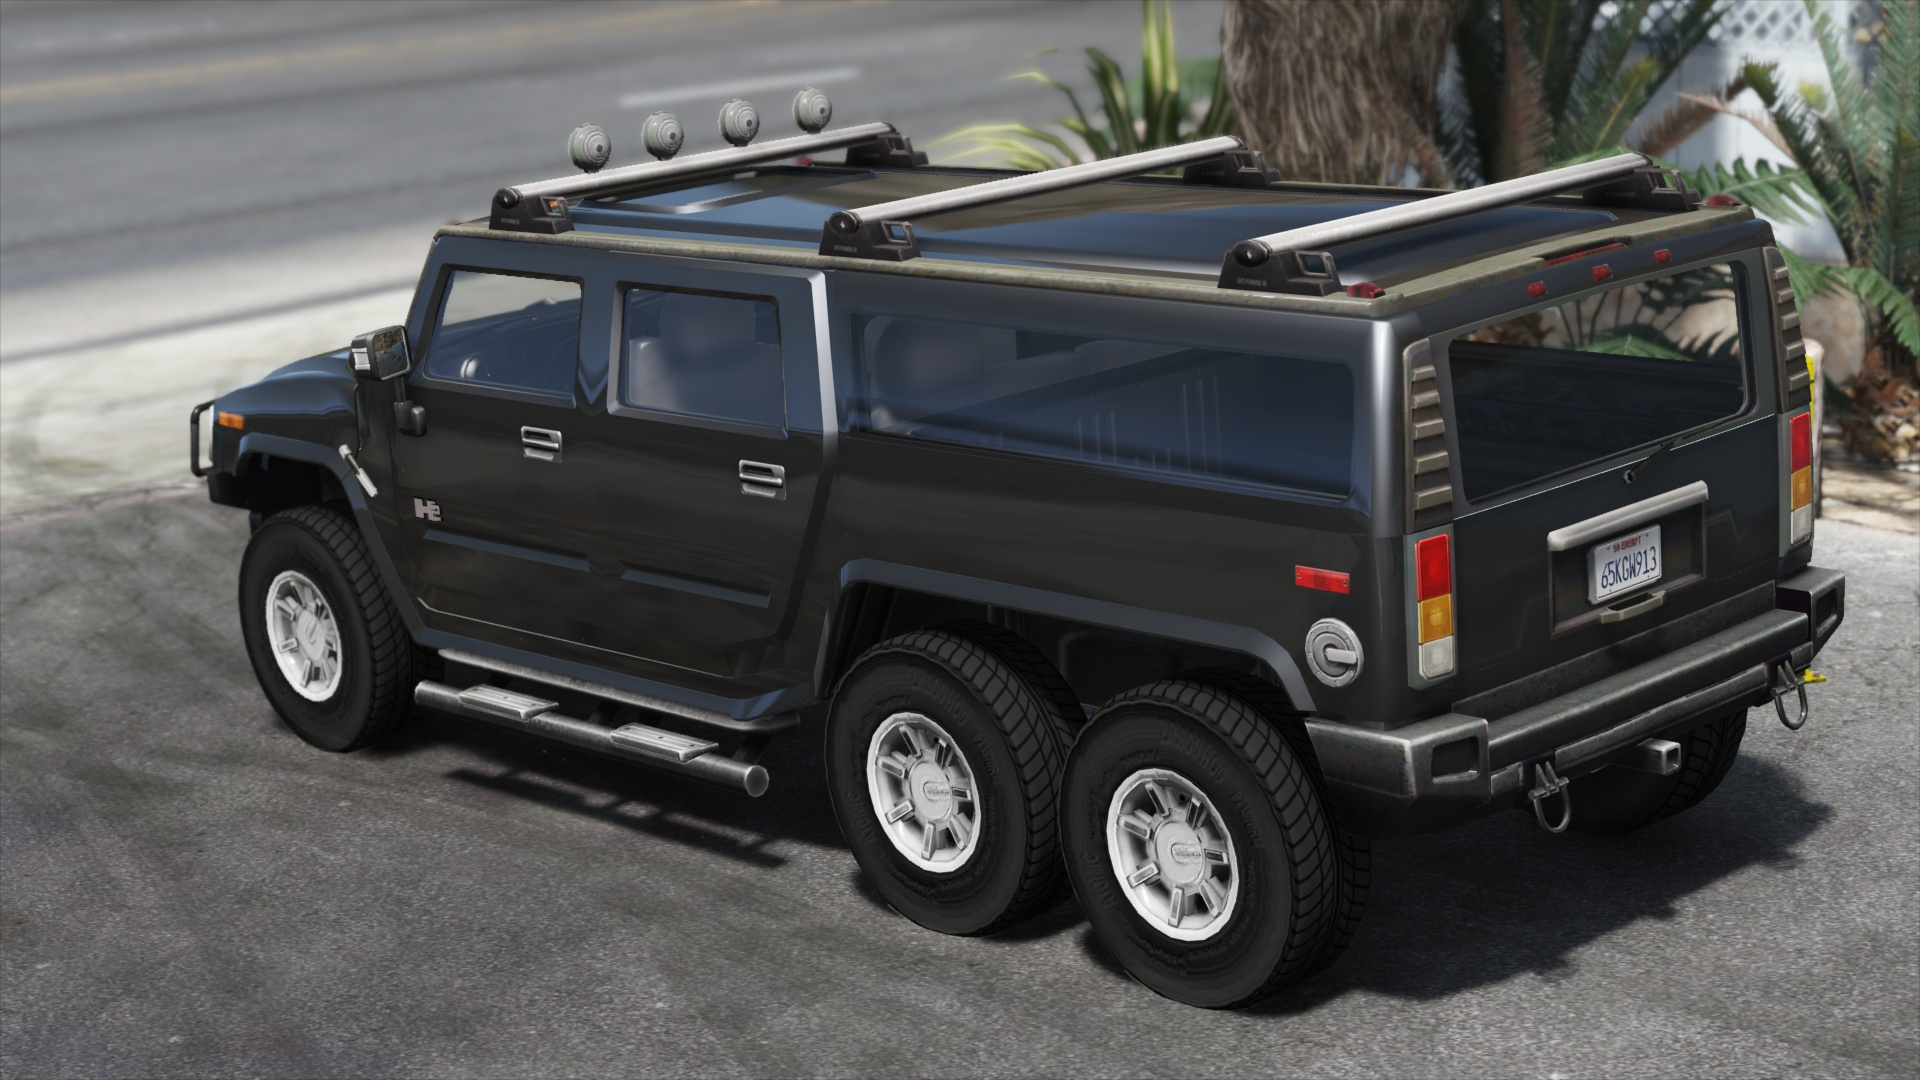 Hummer H6 [Add-On / Rep | Template] - GTA5-Mods.com